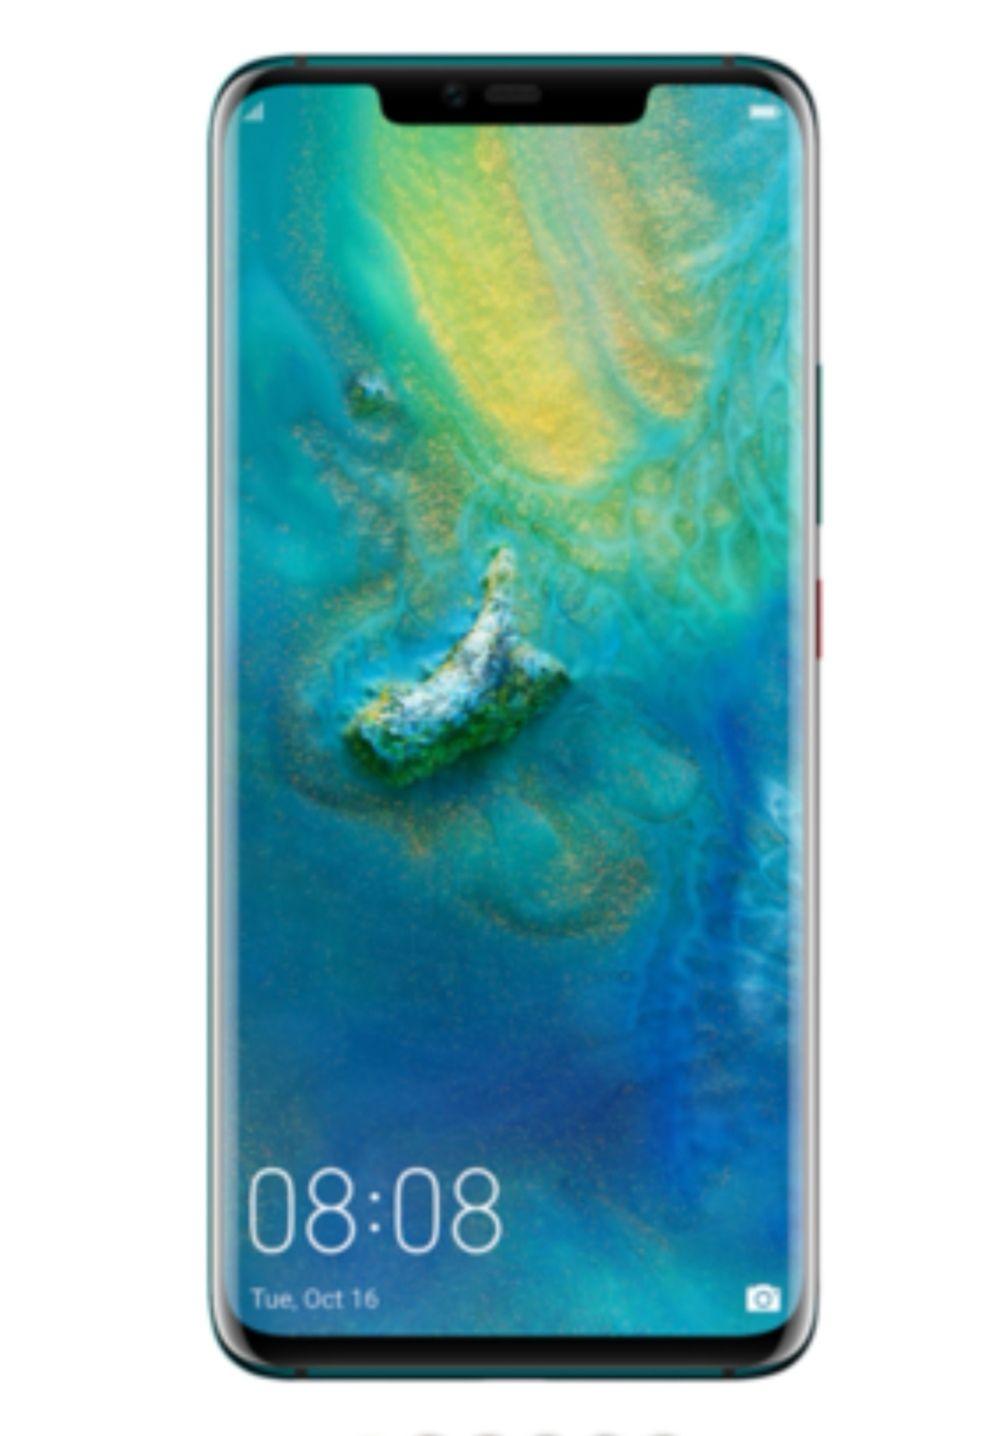 Brand new Huawei Mate 20 Pro unlocked. £449 with free powerbank @ laptopdirect